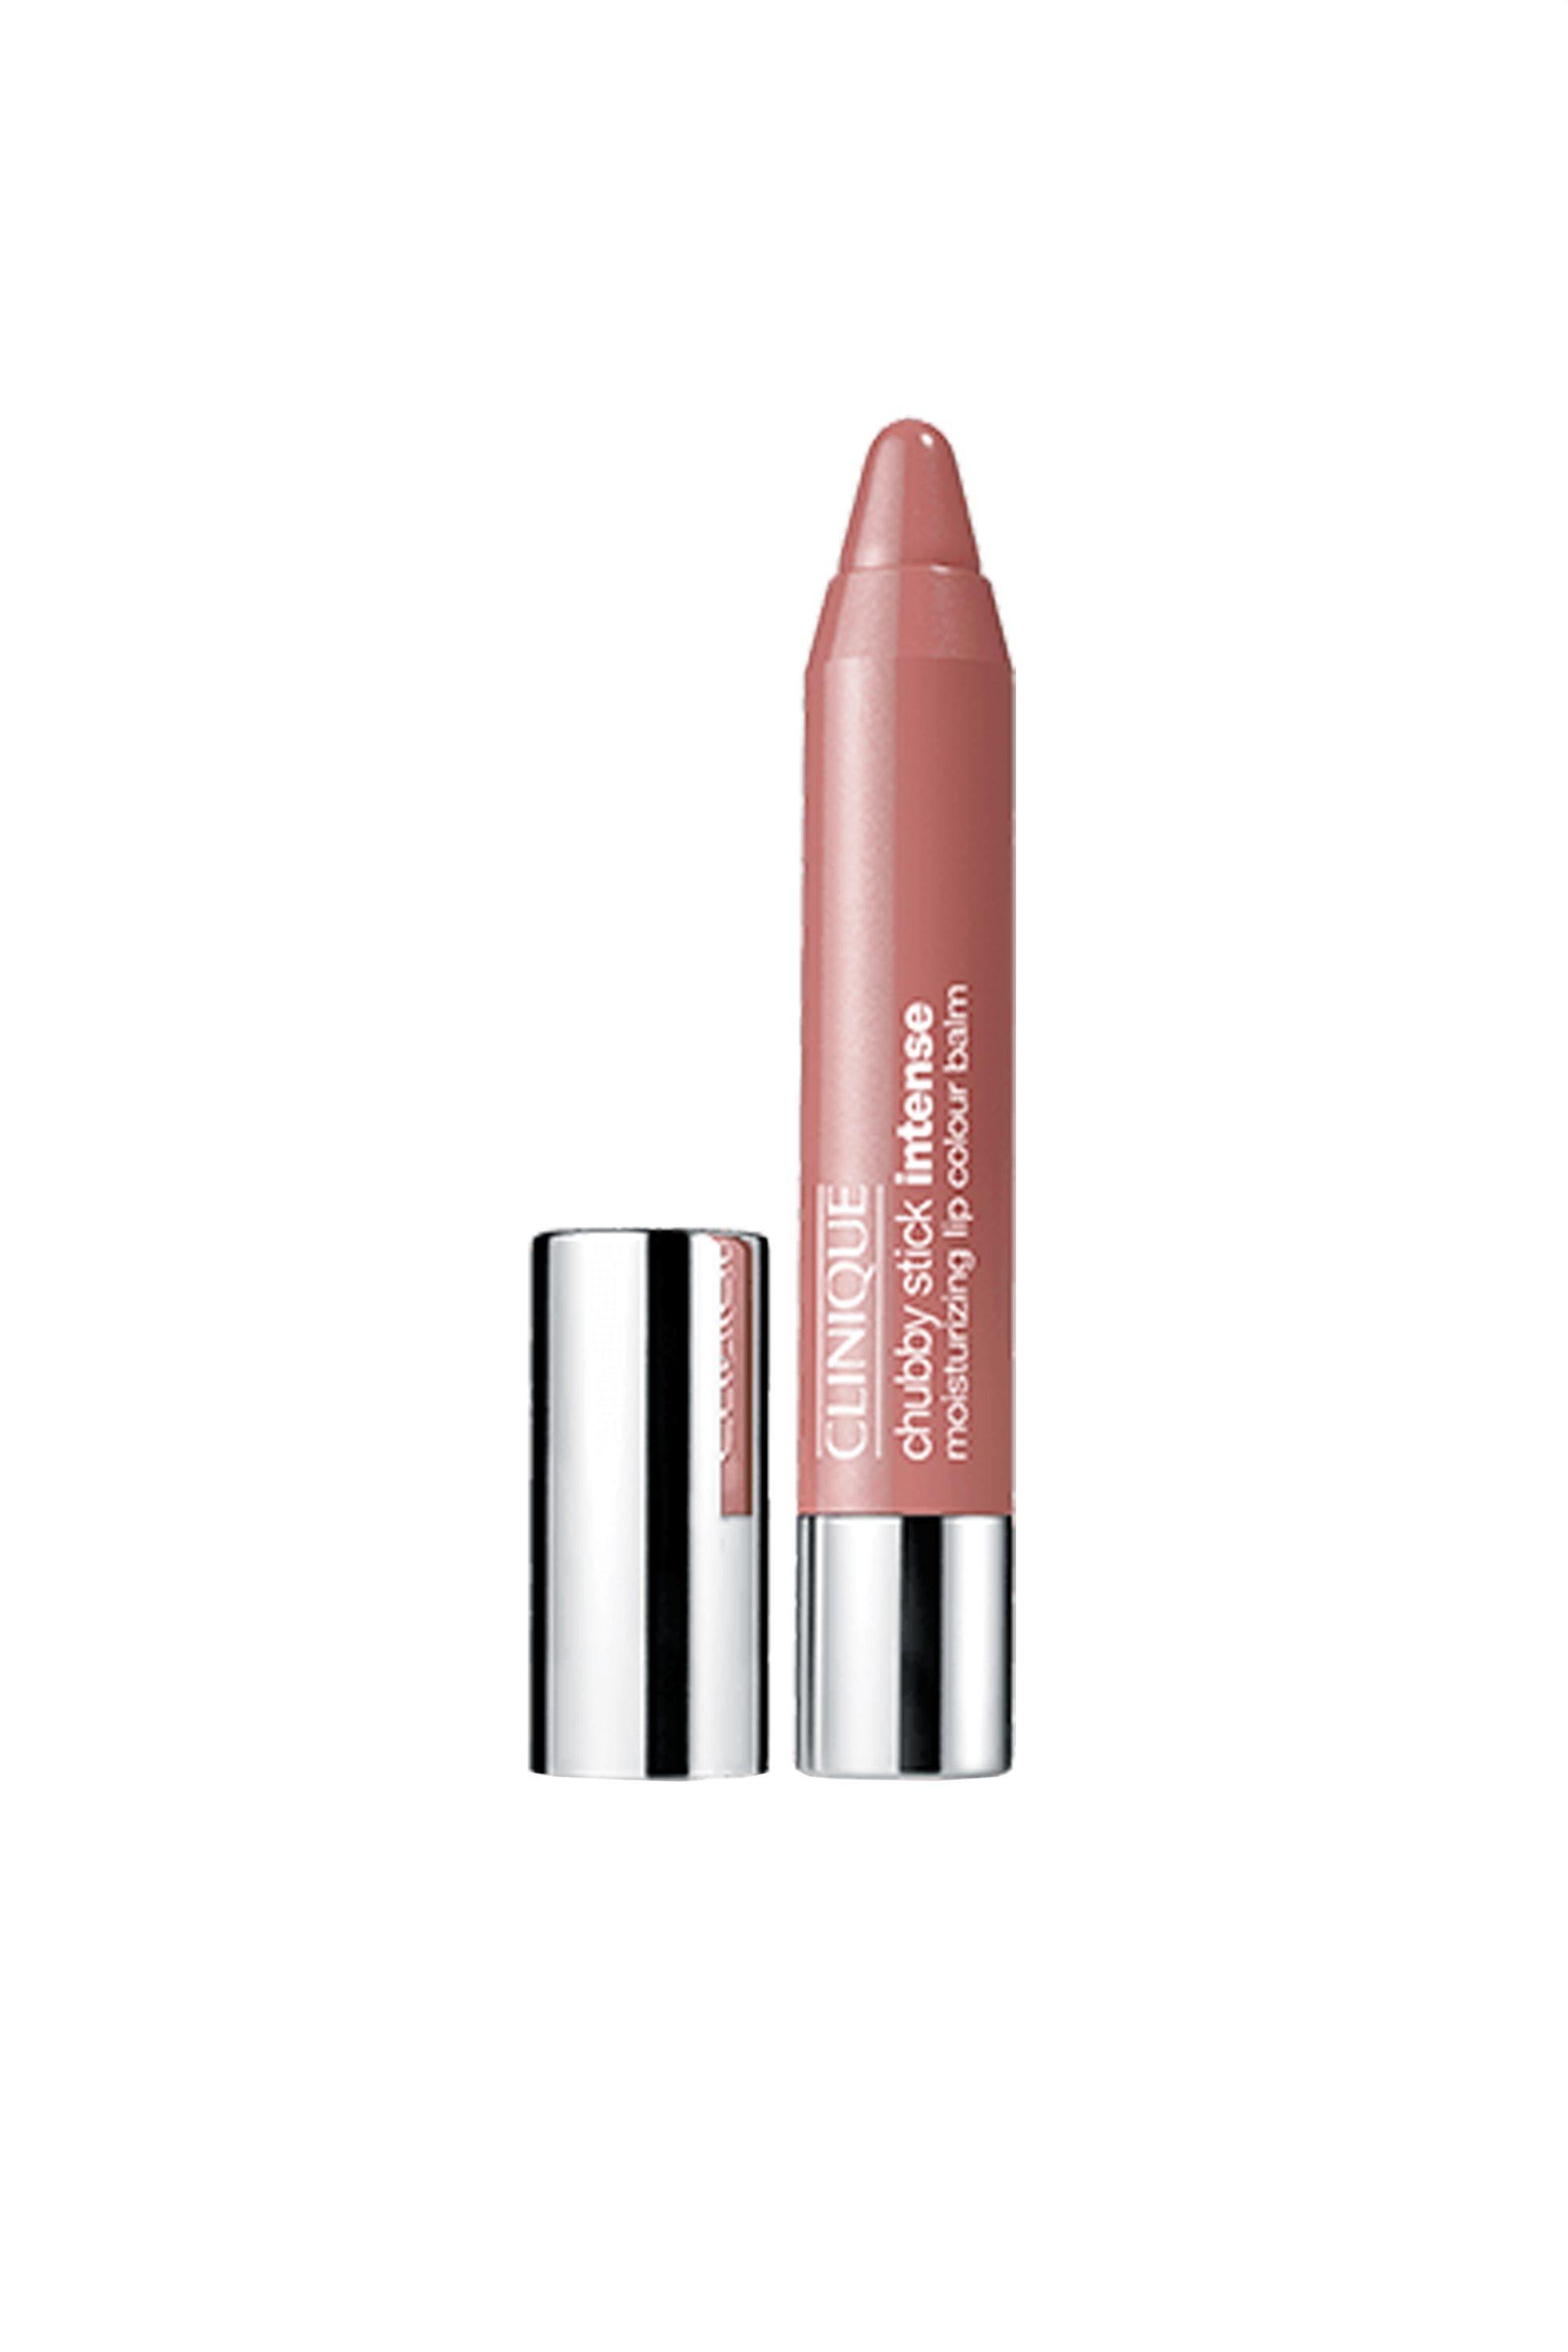 Clinique Chubby Stick Intense™ Moisturizing Lip Colour Balm 01 Curviest Caramel  ομορφια   καλλυντικα επιλεκτικησ   μακιγιάζ   χείλη   lip gloss   balms